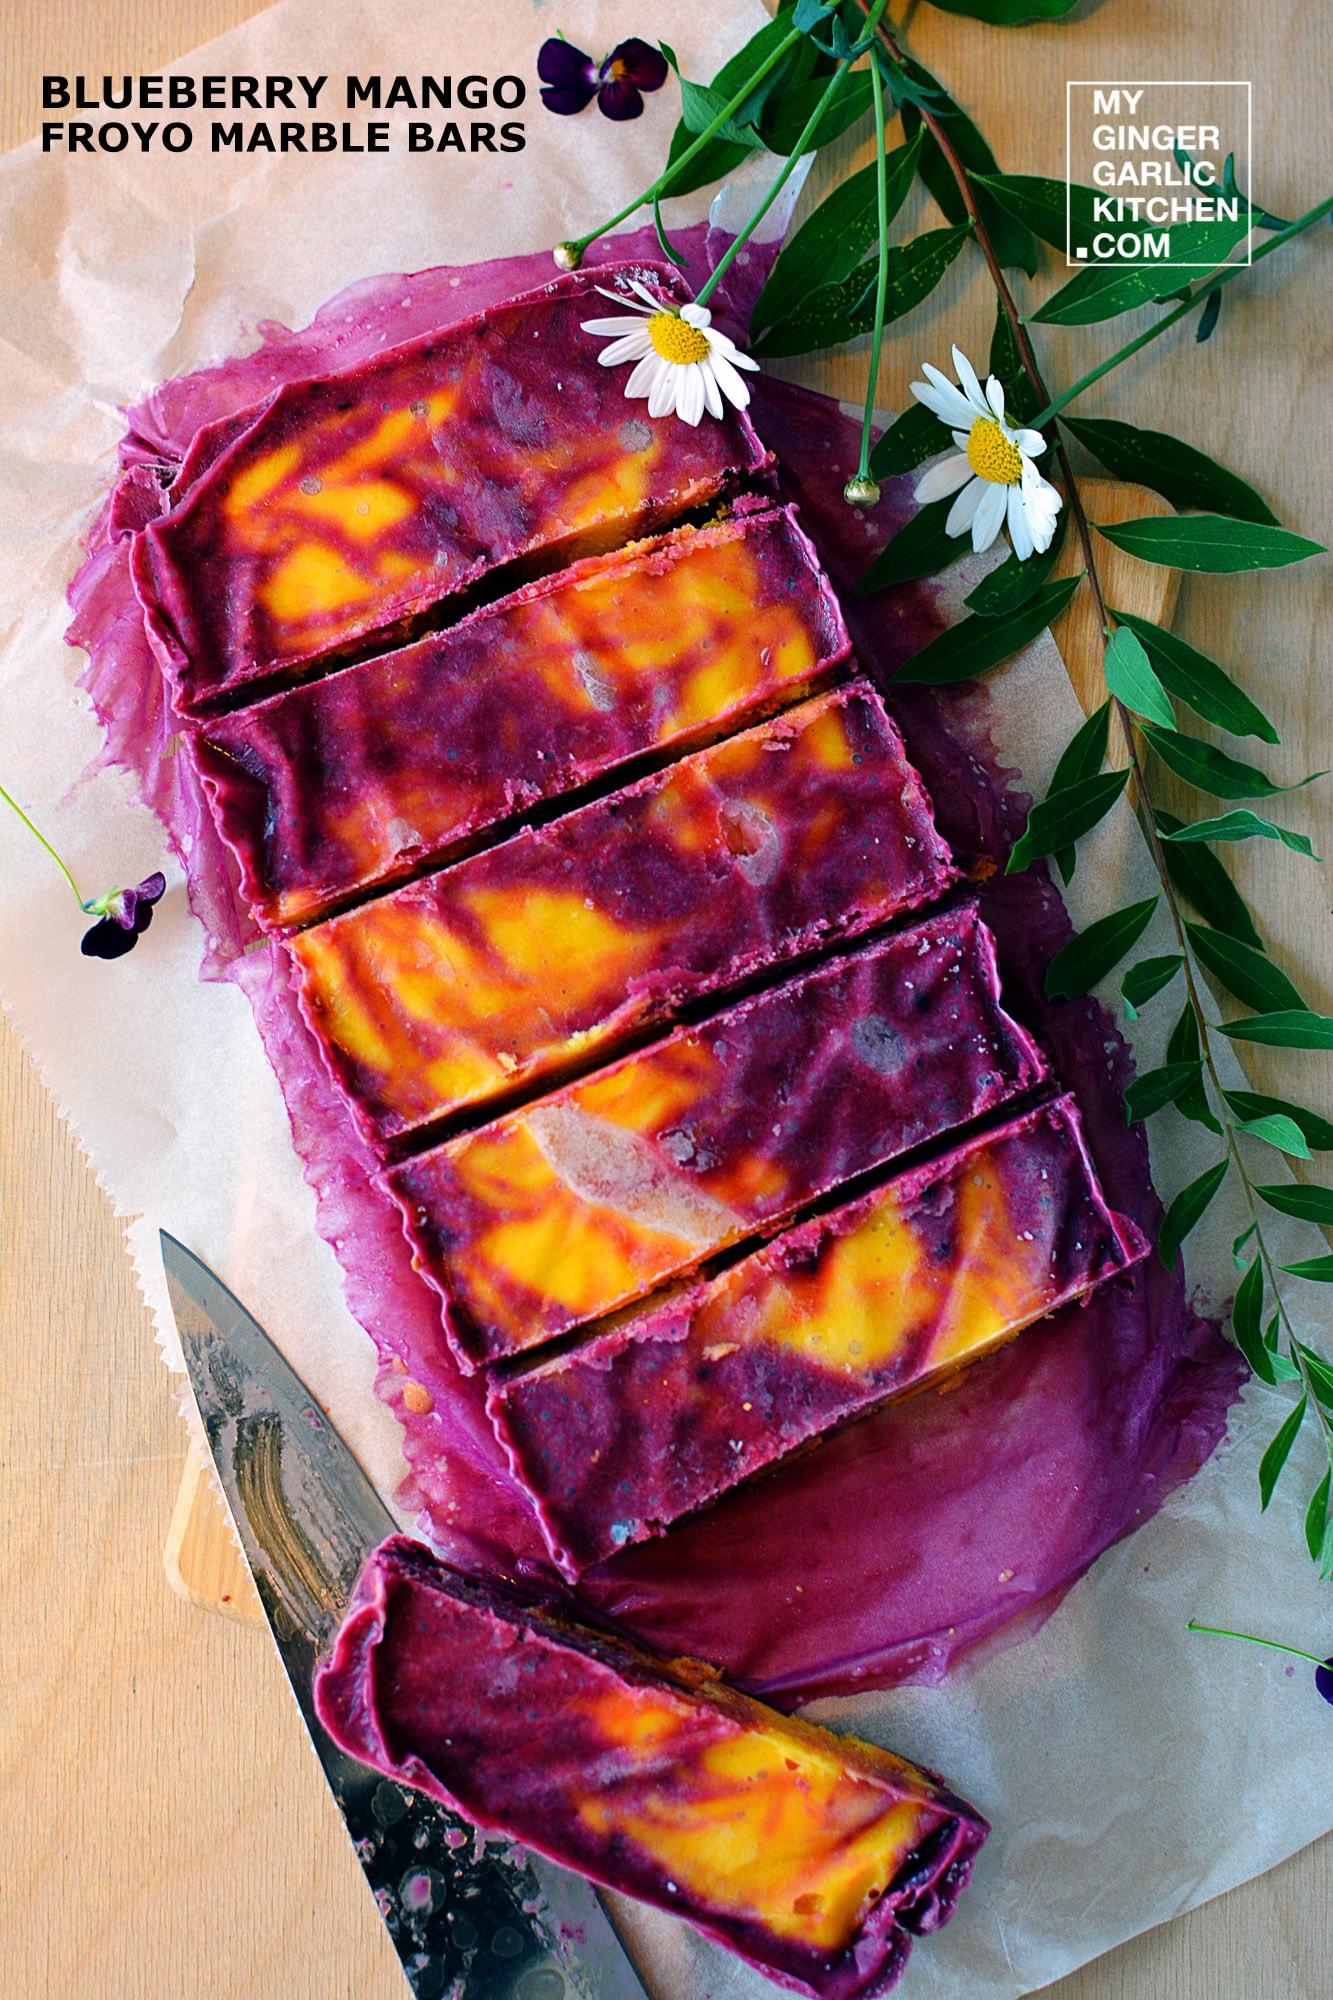 Image - recipe blueberry mango froyo marble bars anupama paliwal my ginger garlic kitchen 2